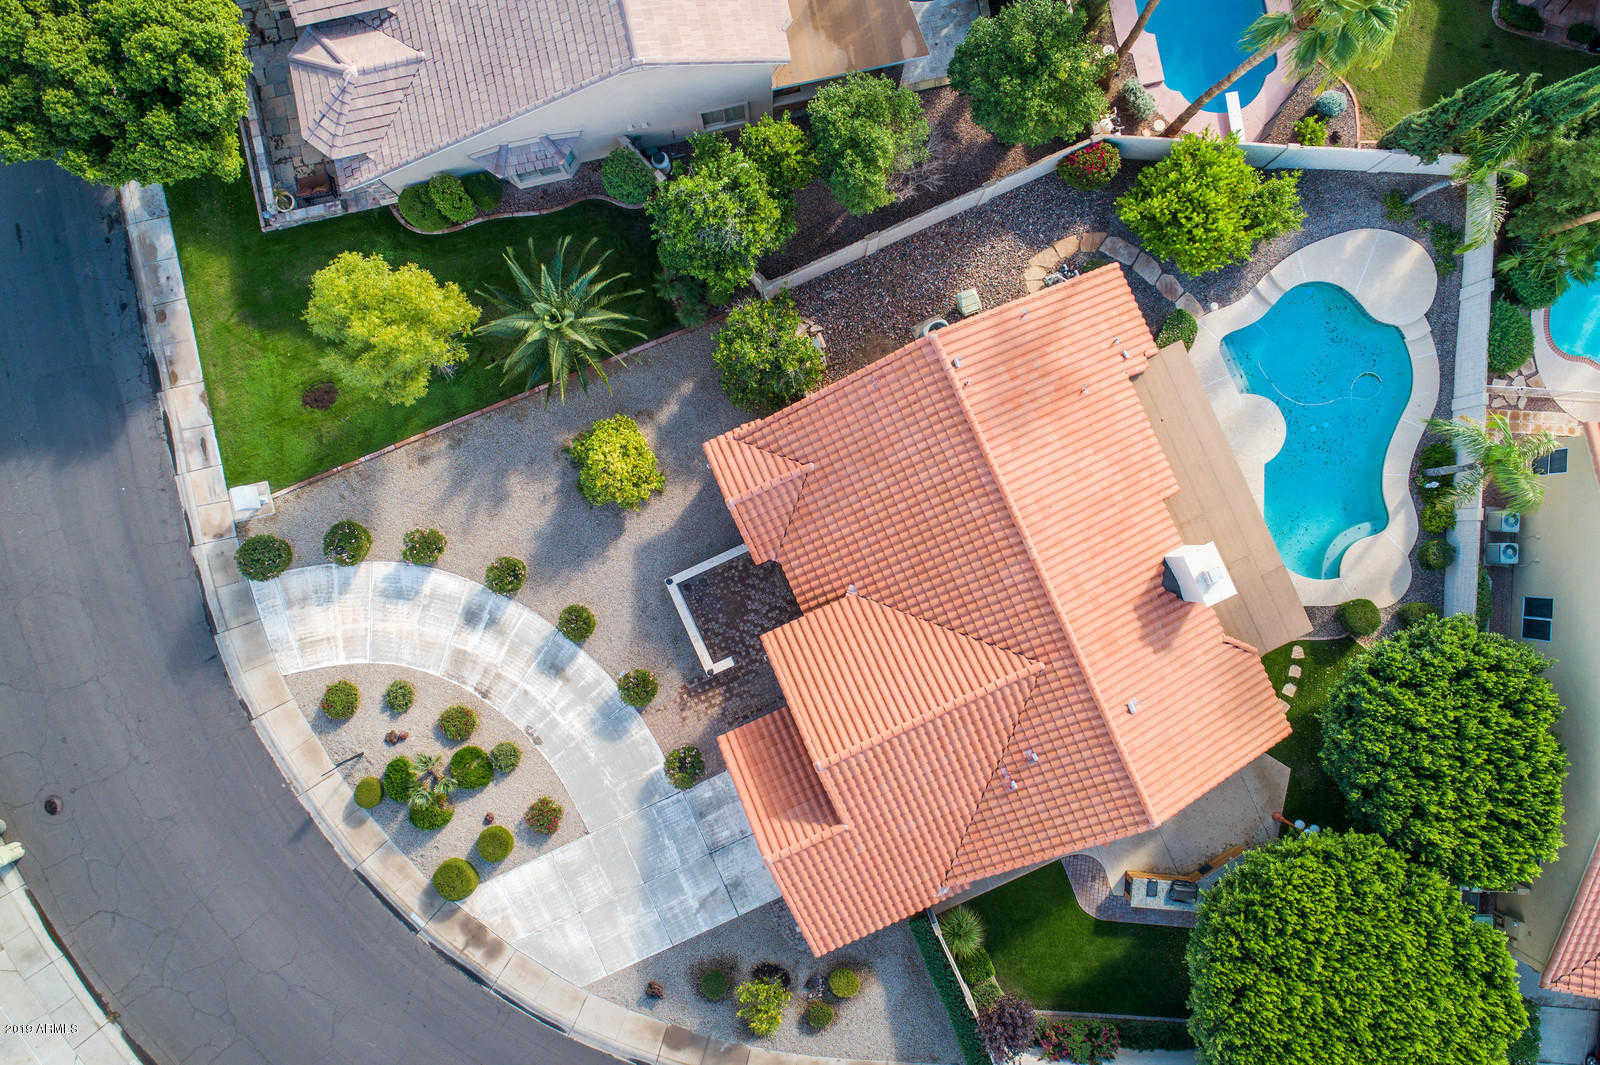 $389,900 - 2Br/2Ba - Home for Sale in Arrowhead Oasis Amd Lt 1-88 Tr A Drainage Easmt, Glendale